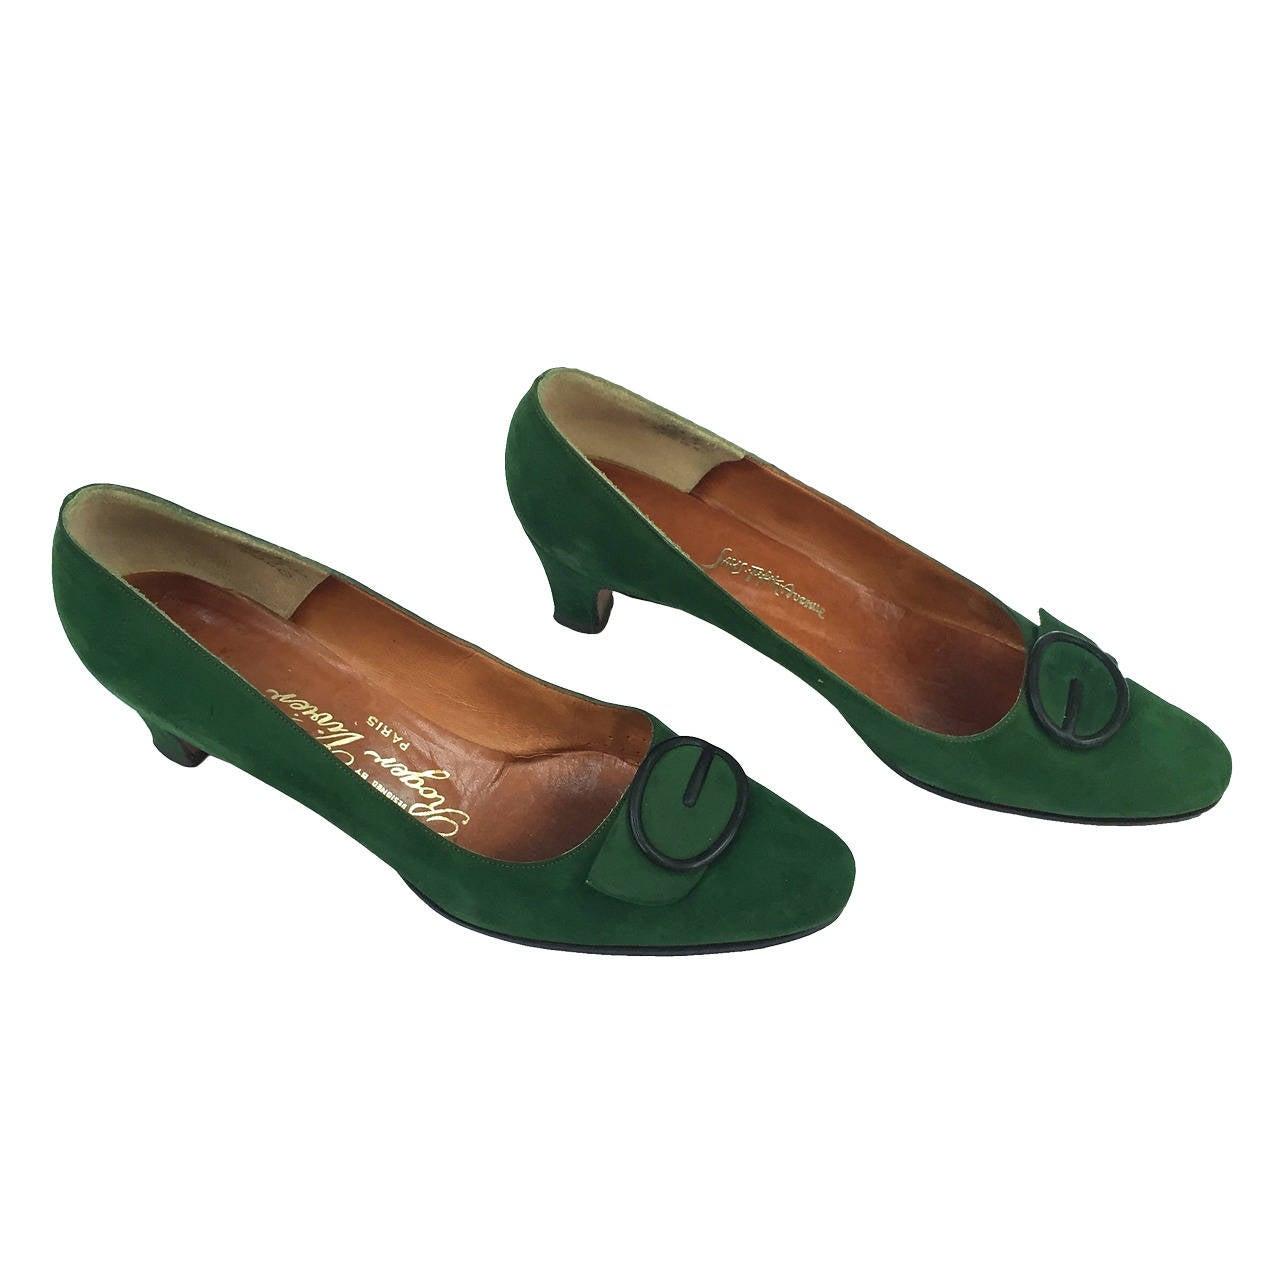 Roger Vivier for Sak's Fifth Avenue 60s green suede heels ...